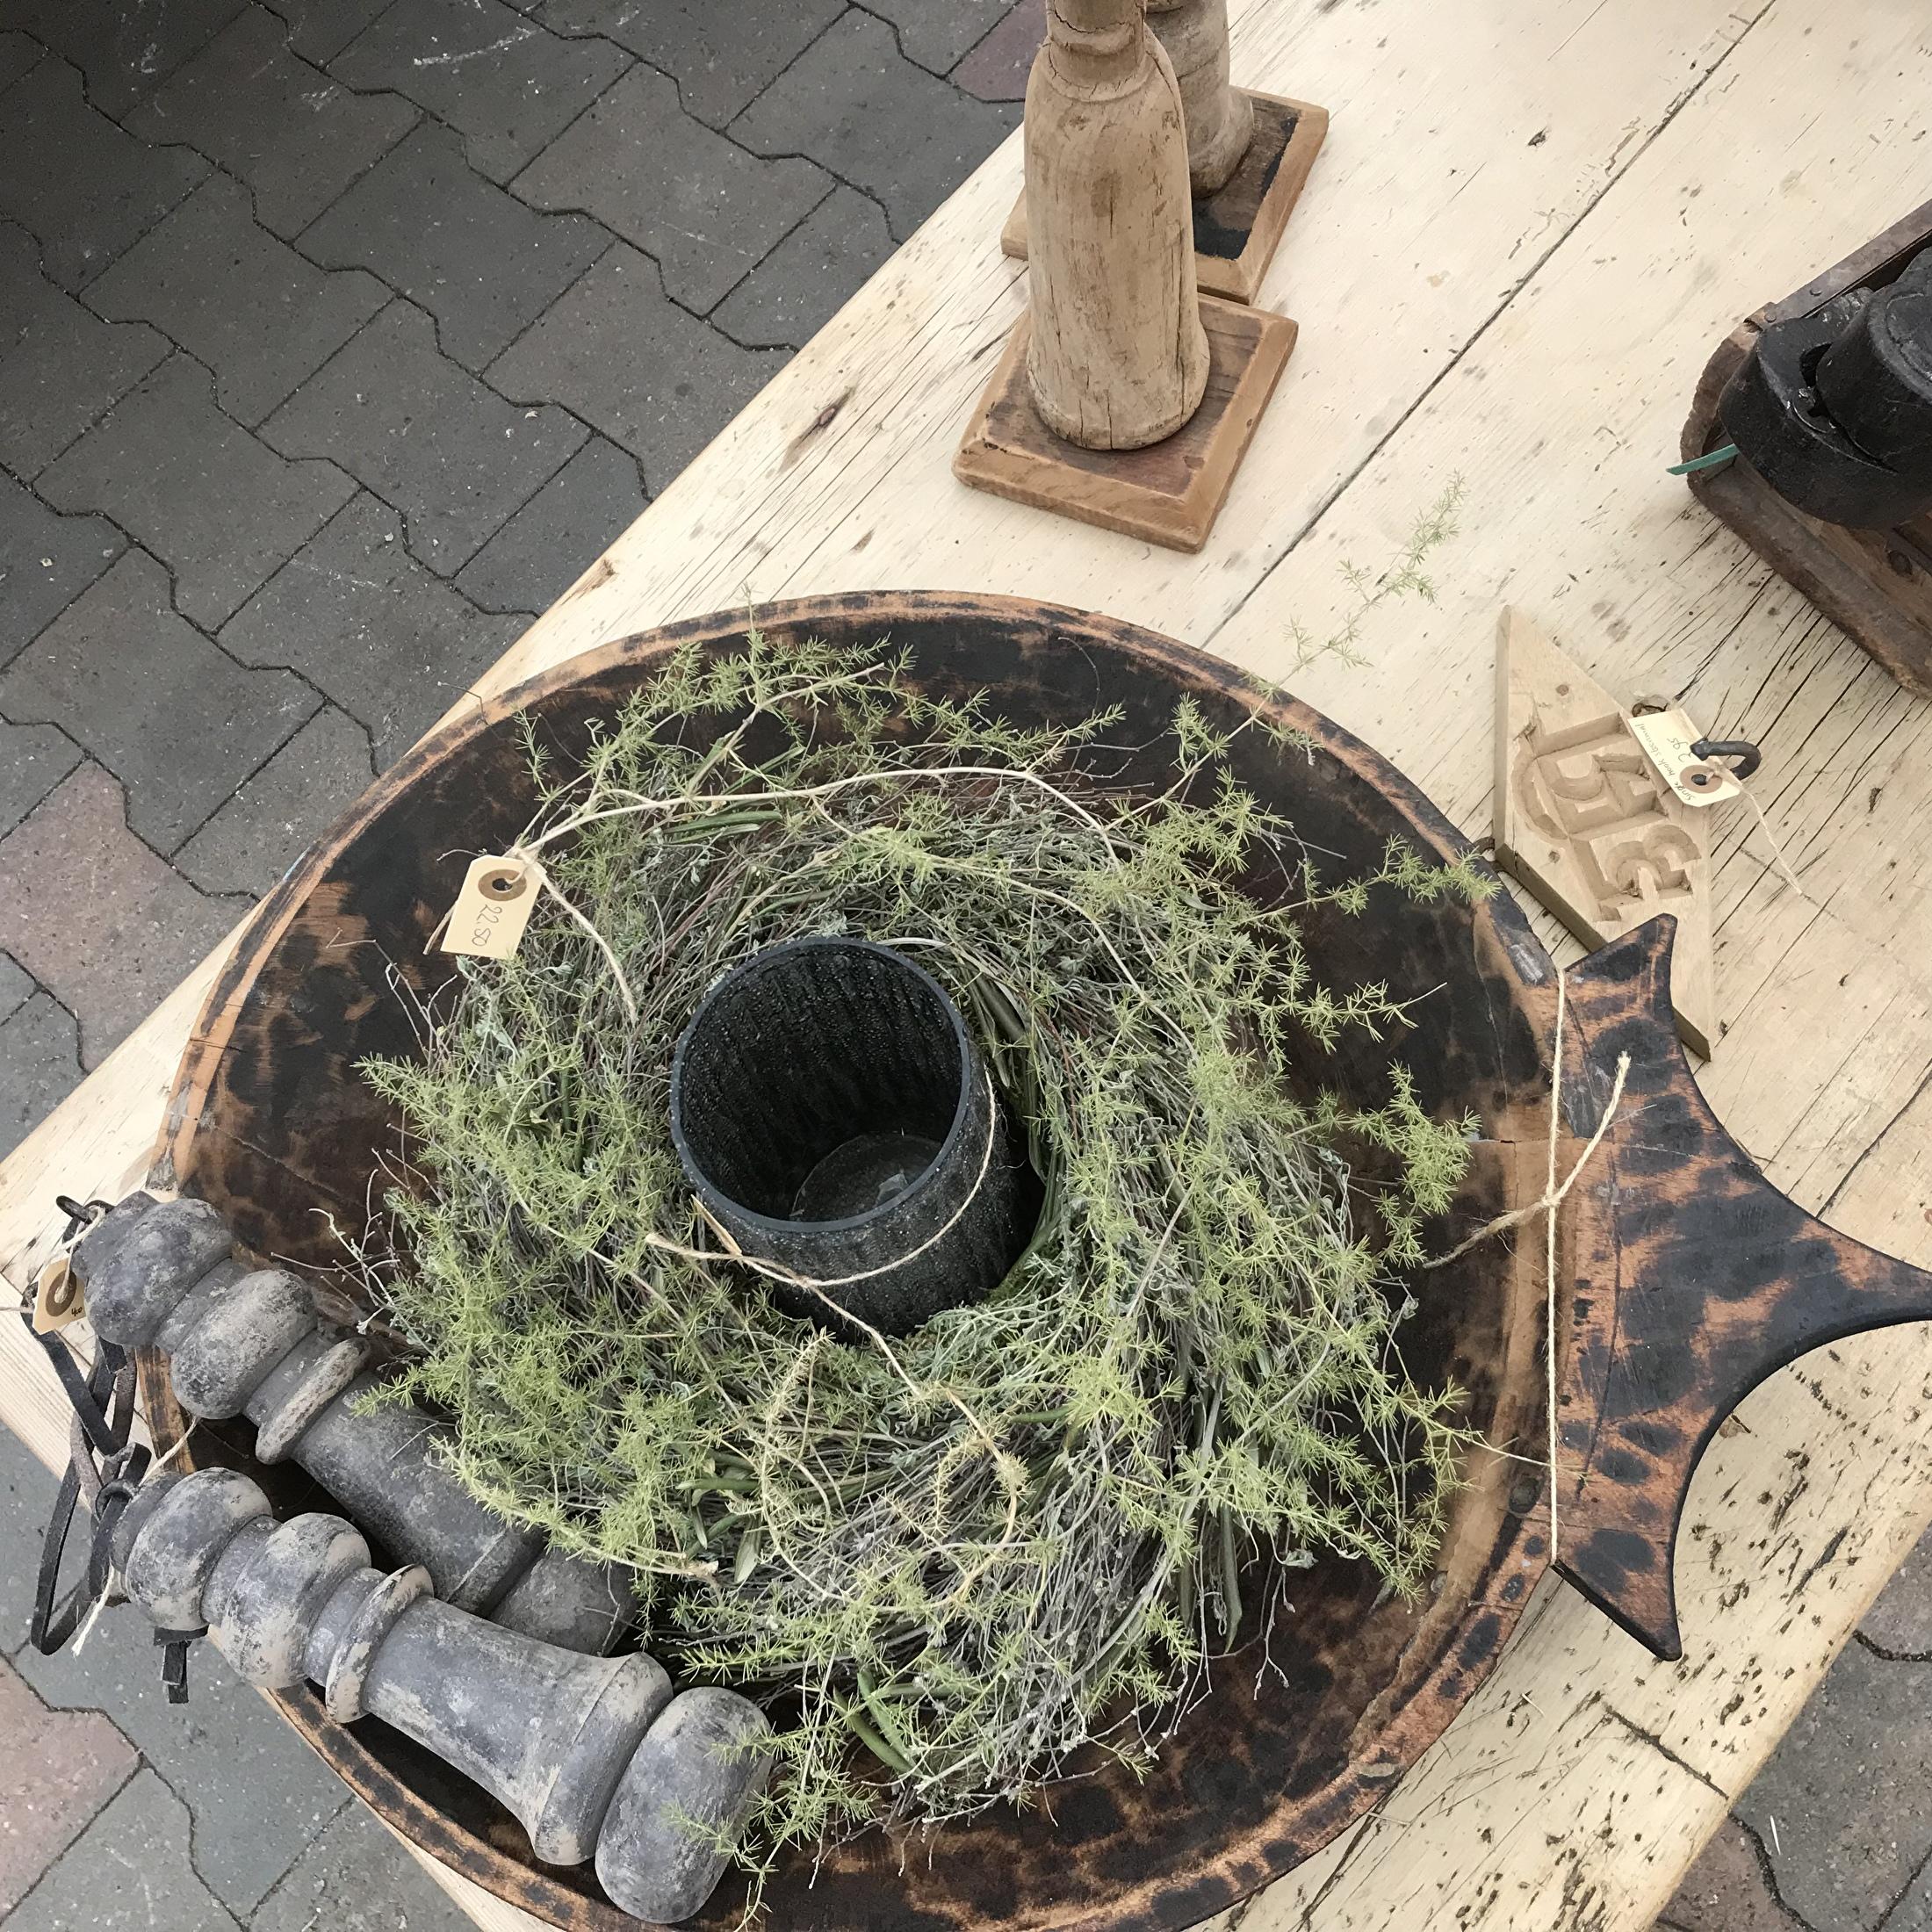 Tuincentrum de Landerije Roosendaal